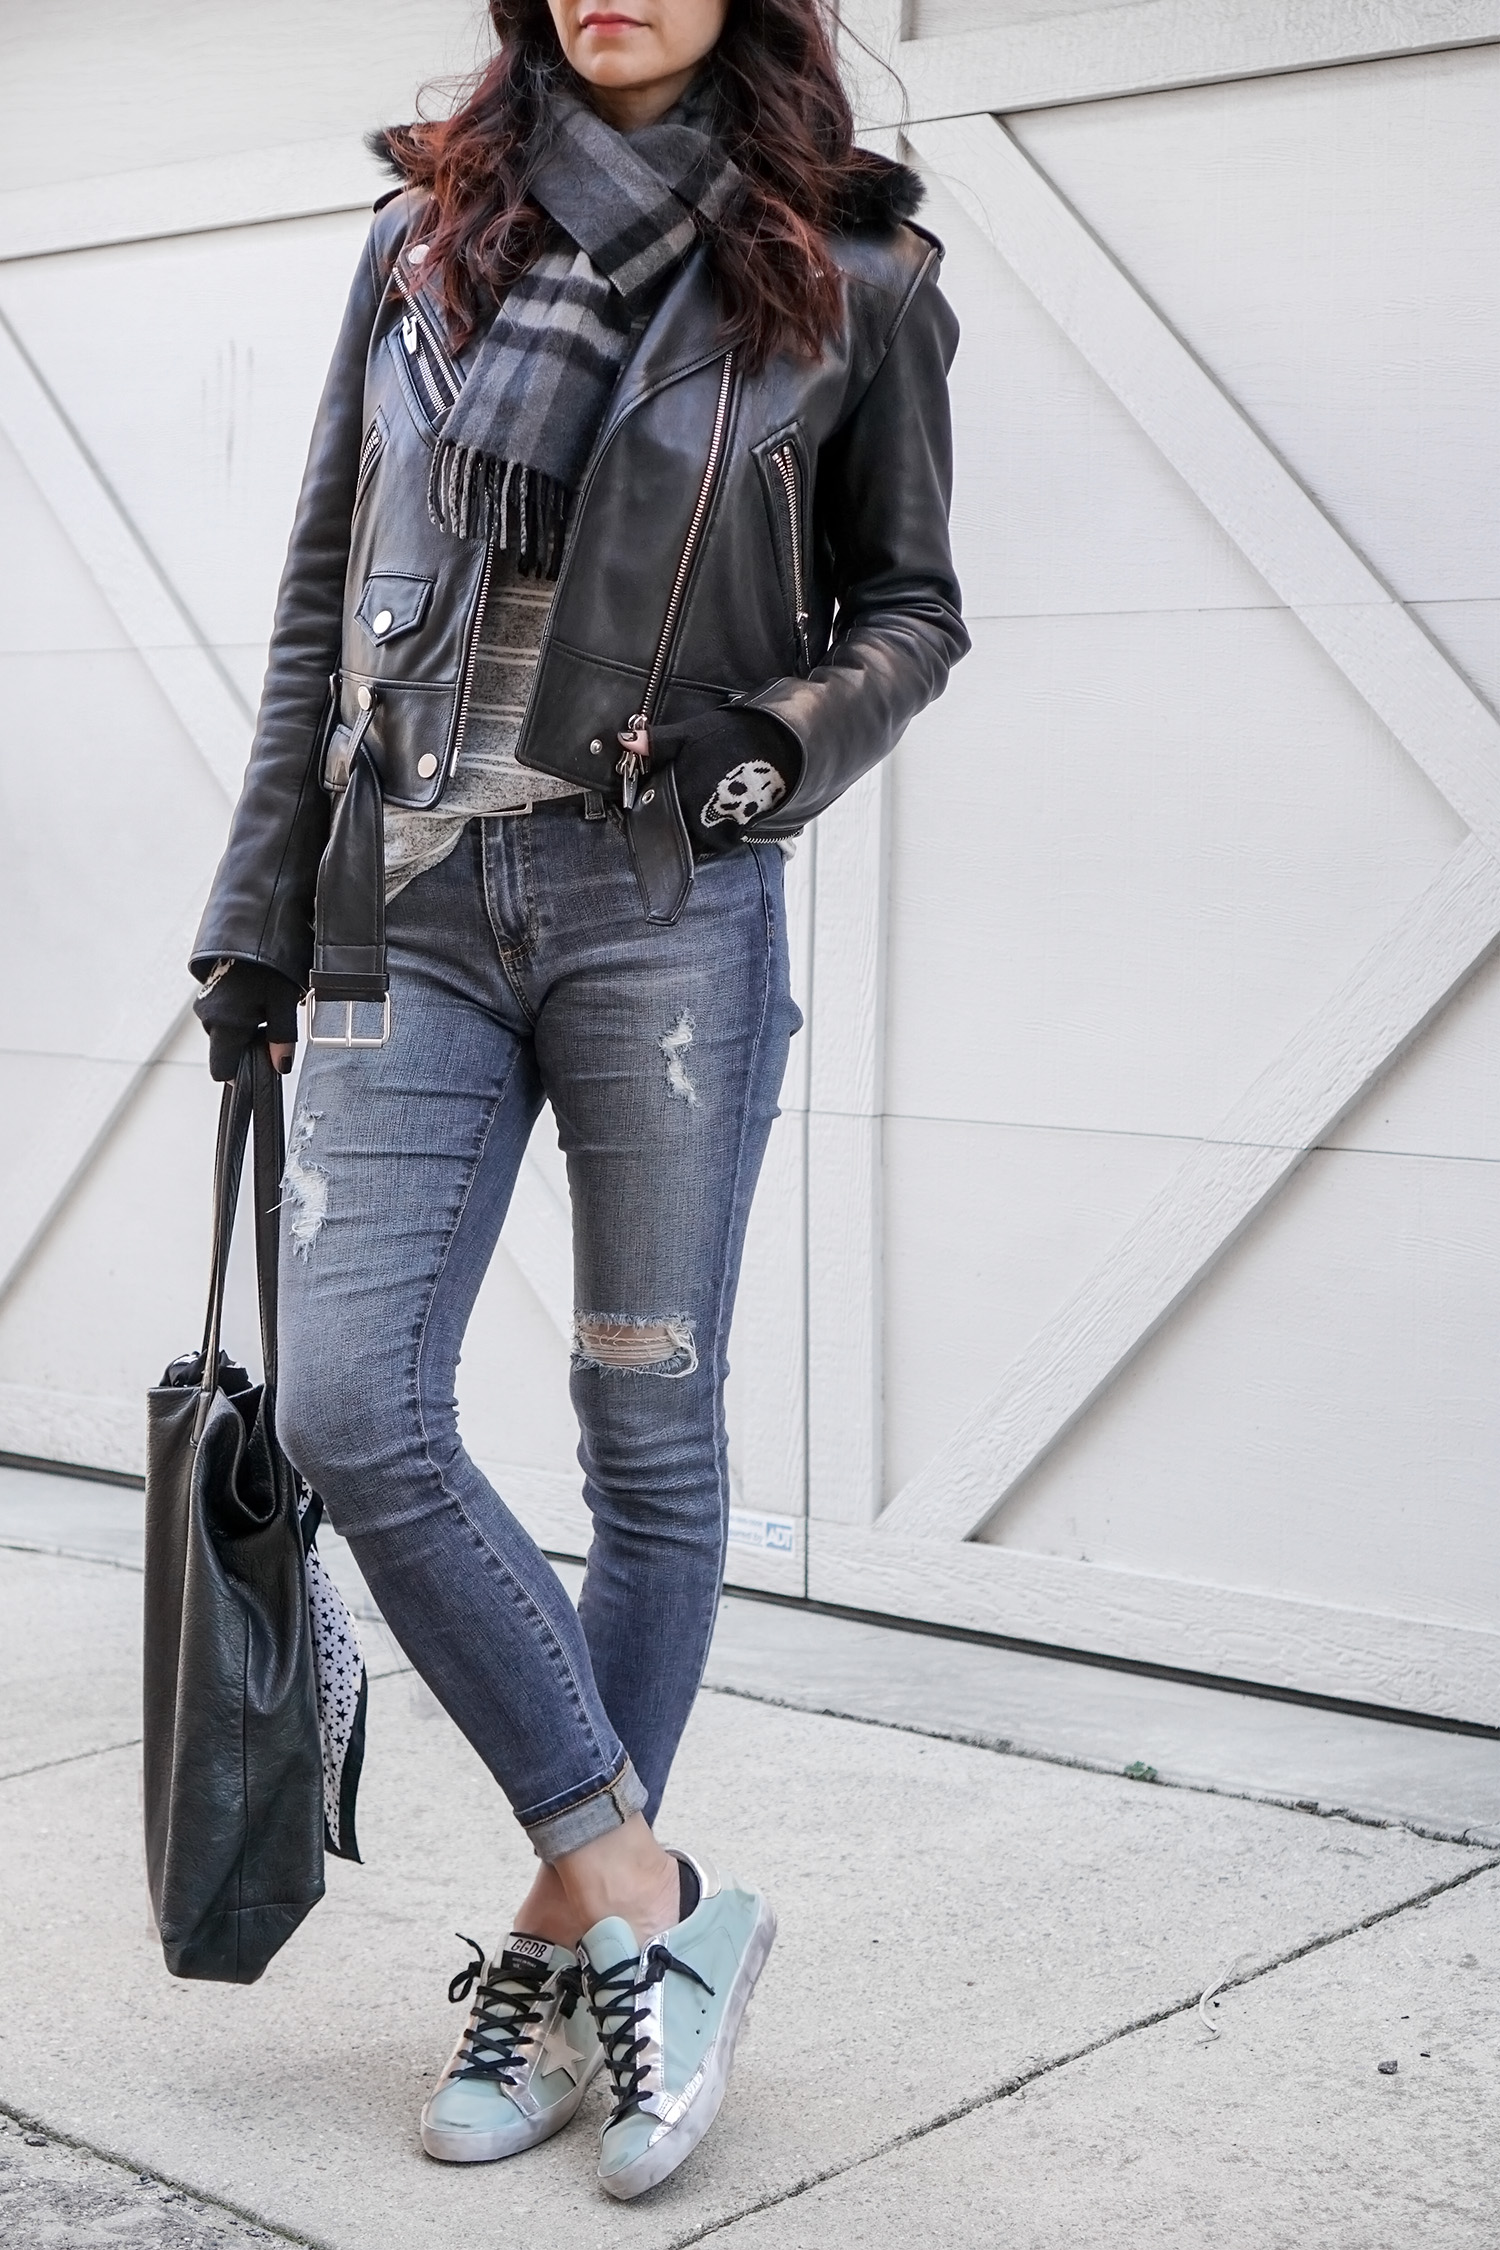 The Arrivals Leather Jacket, Skull Cashmere Gloves, Golden Goose Sneakers